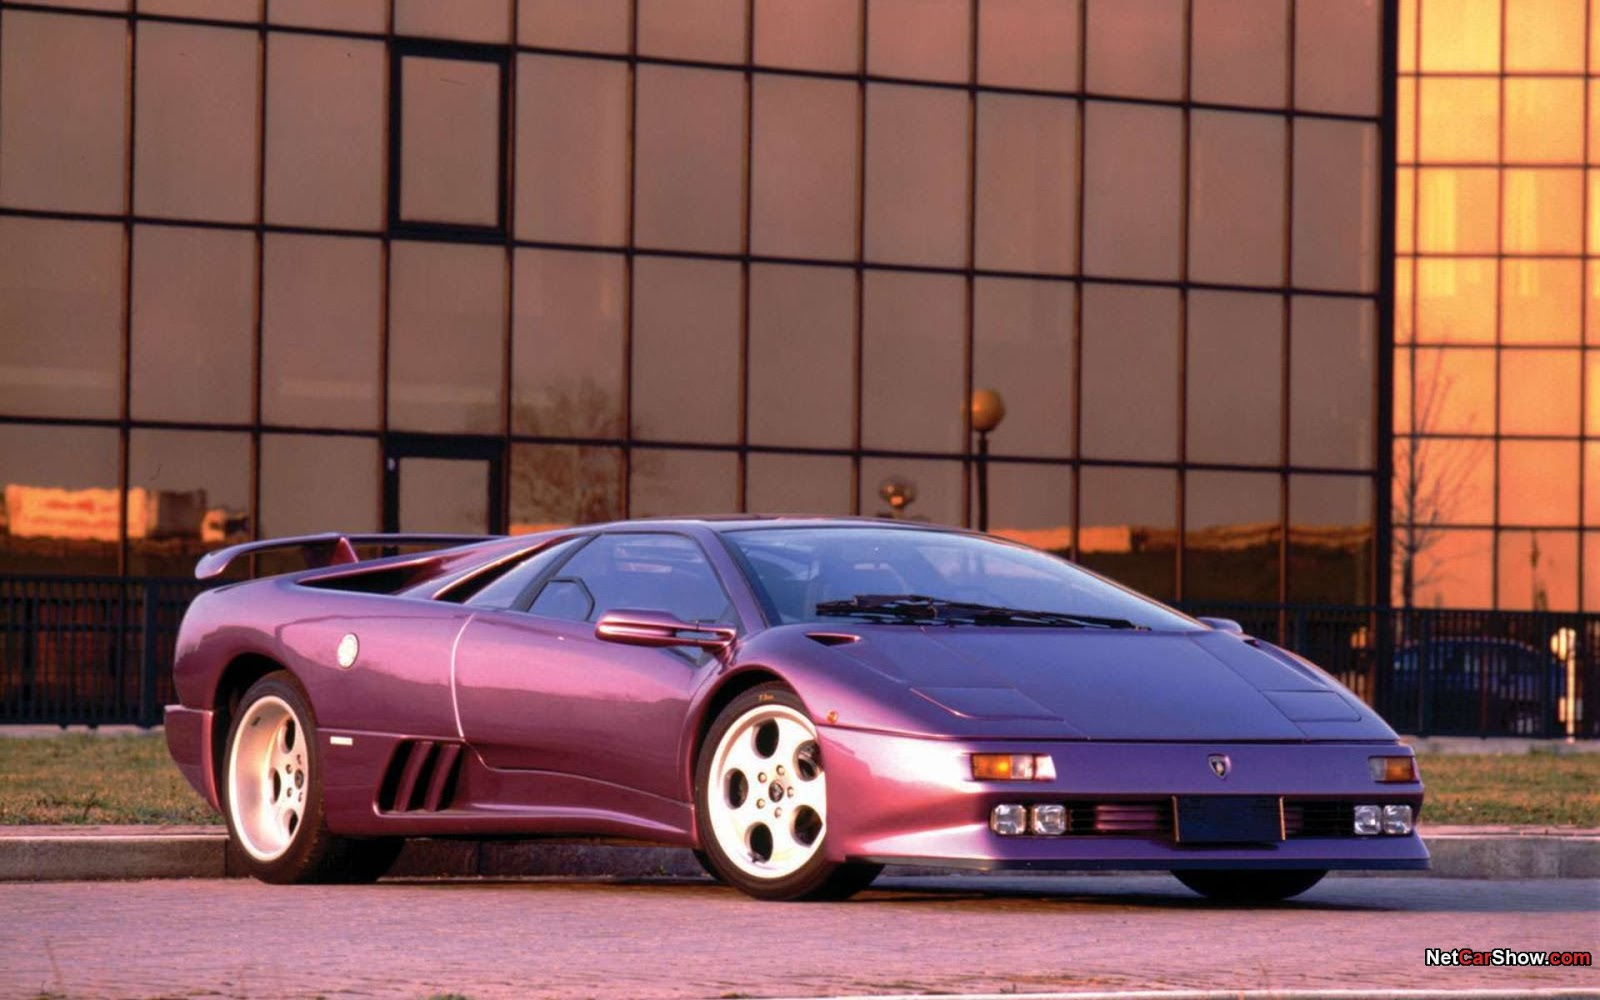 Luxury Lamborghini Cars: Lamborghini Diablo